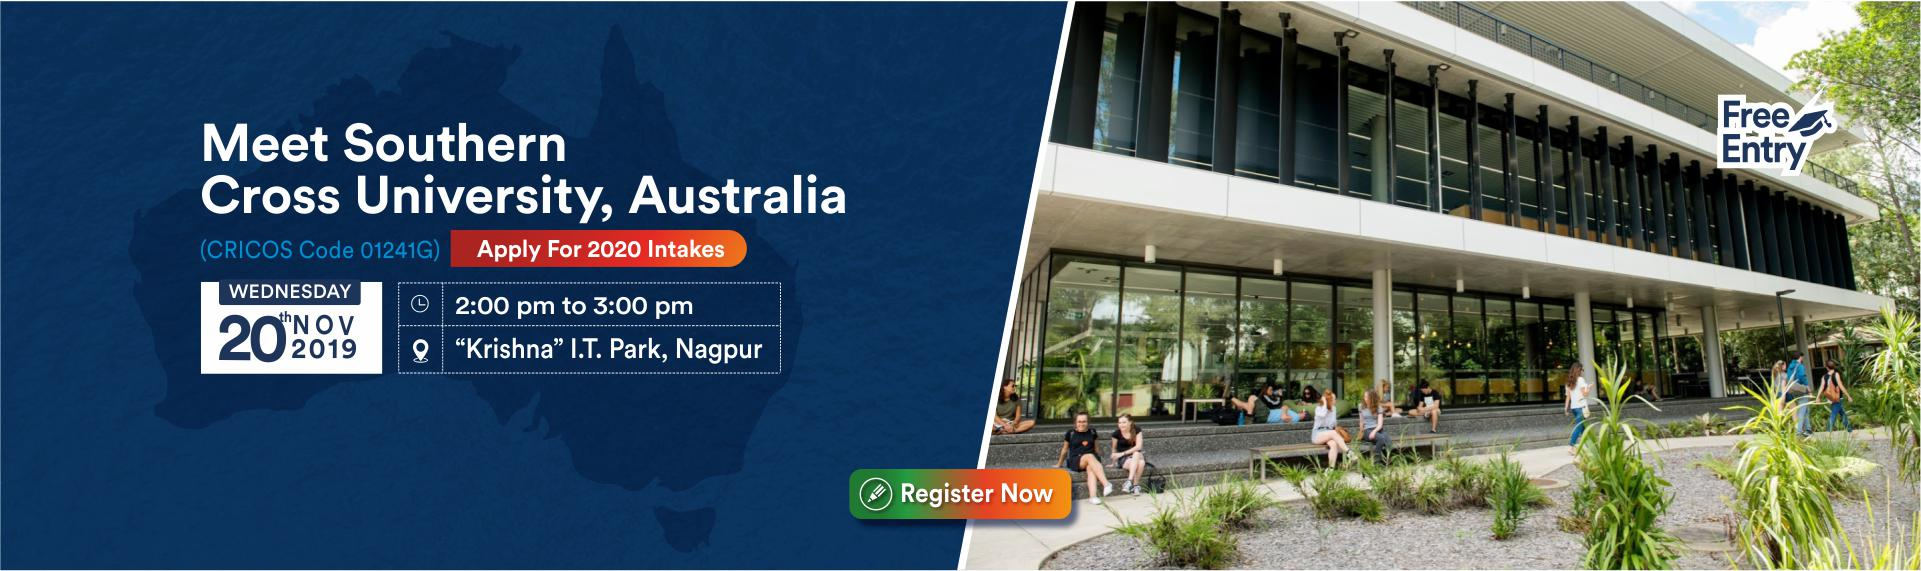 Meet & Apply to Southern Cross University, Australia on 20th Nov 19 - KC Nagpur